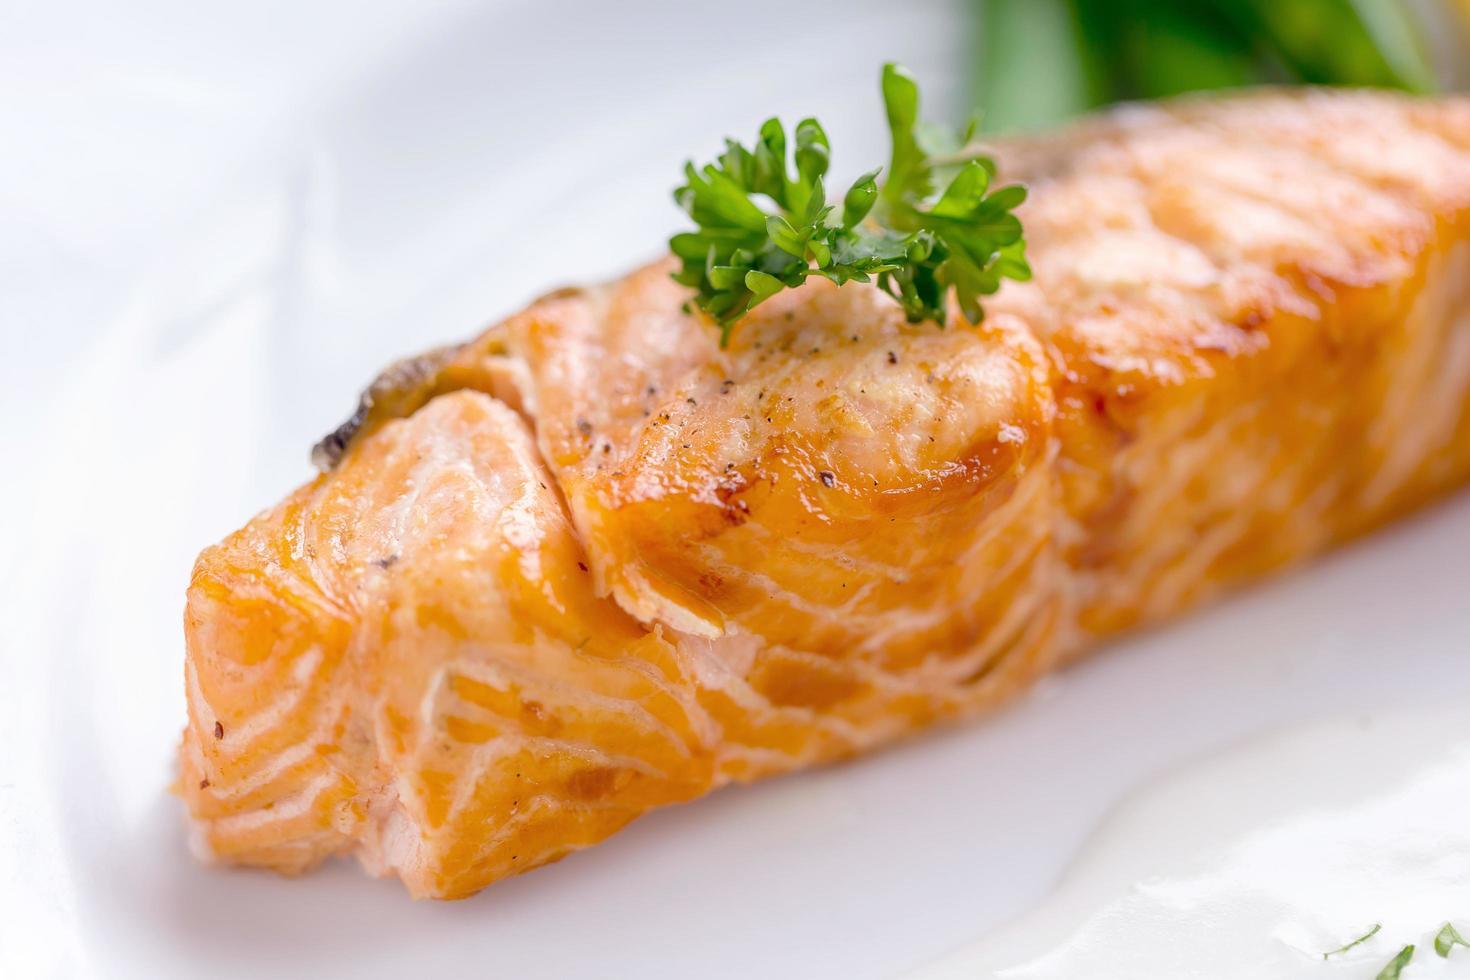 Salmon steak with white sauce on a white plate photo